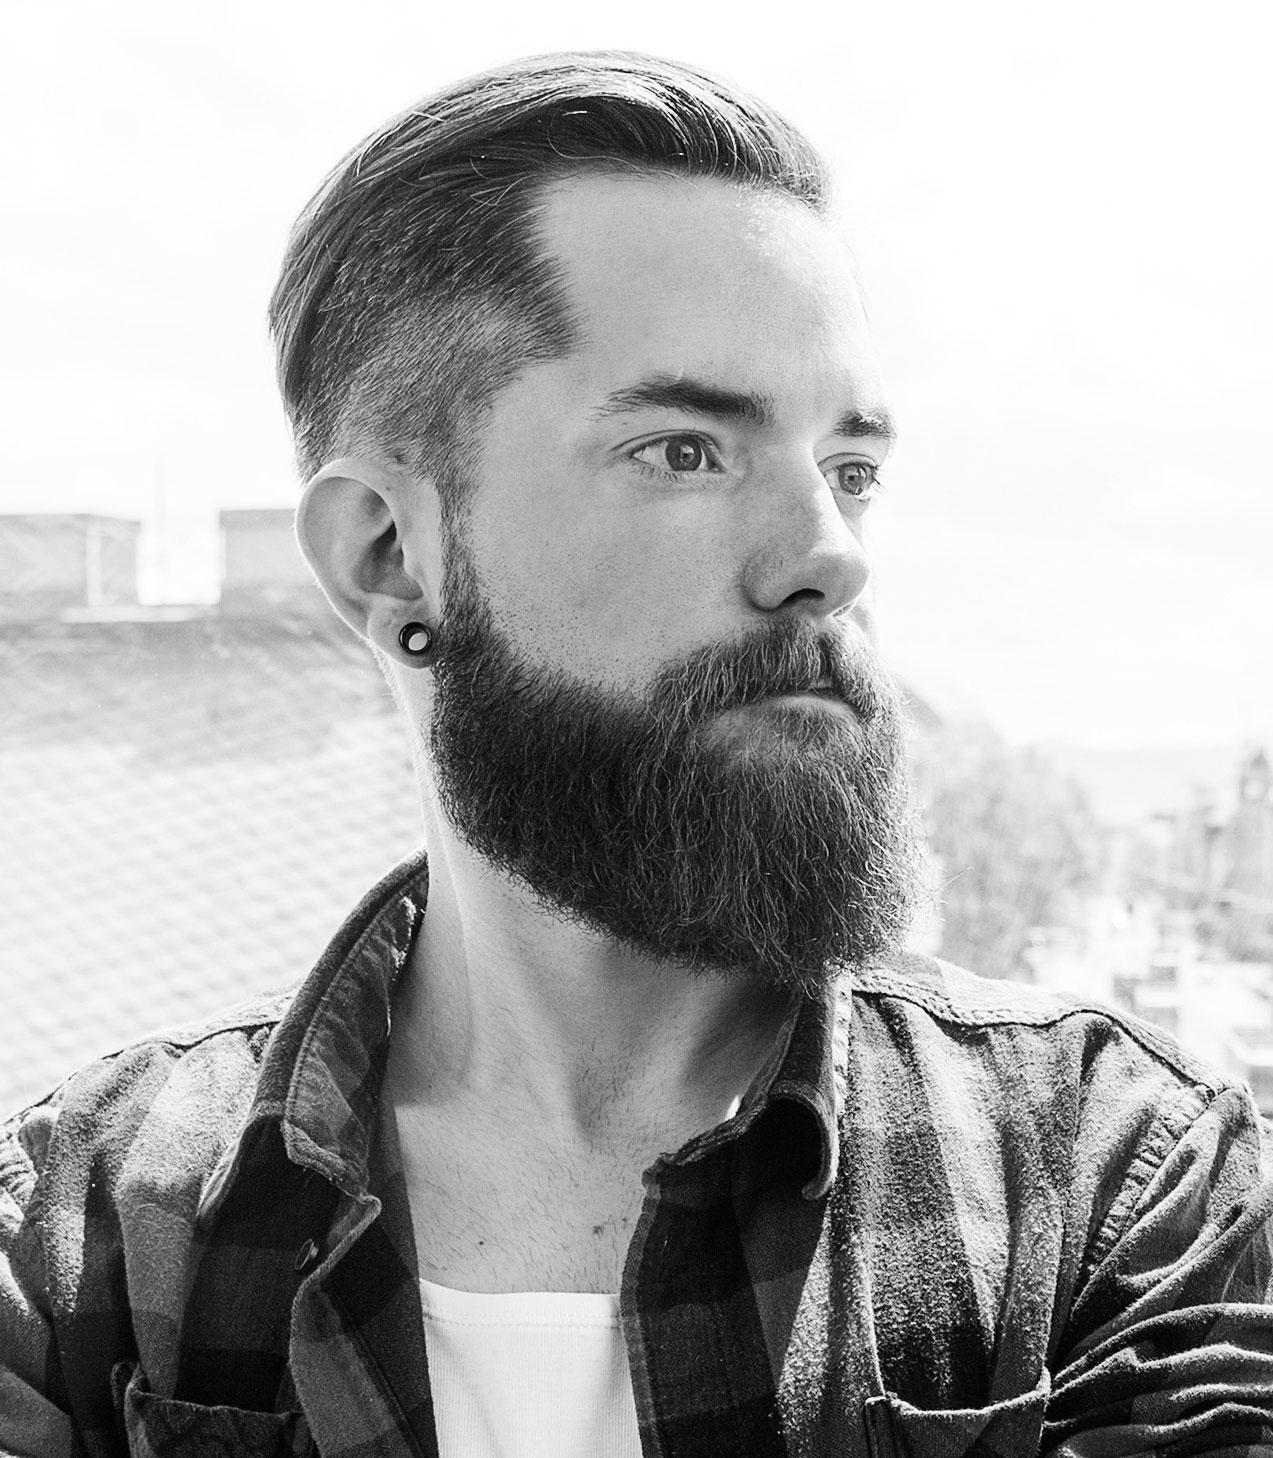 Tristan Kappel